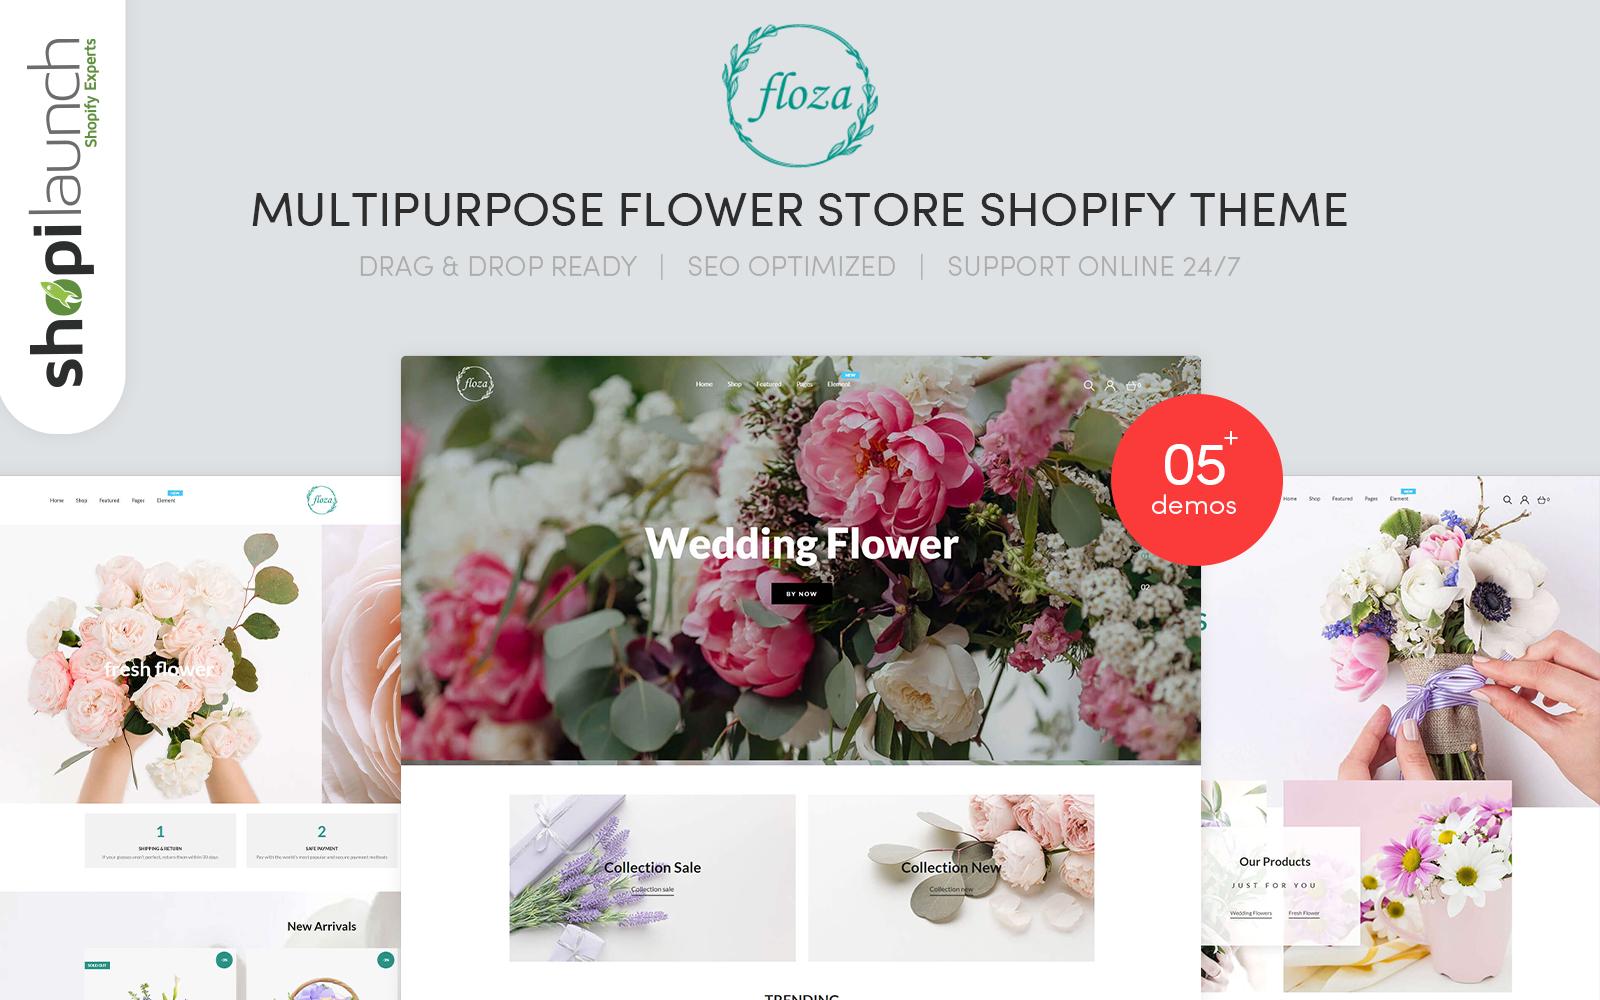 Tema para shopify - Categoría: Flores - versión para Desktop